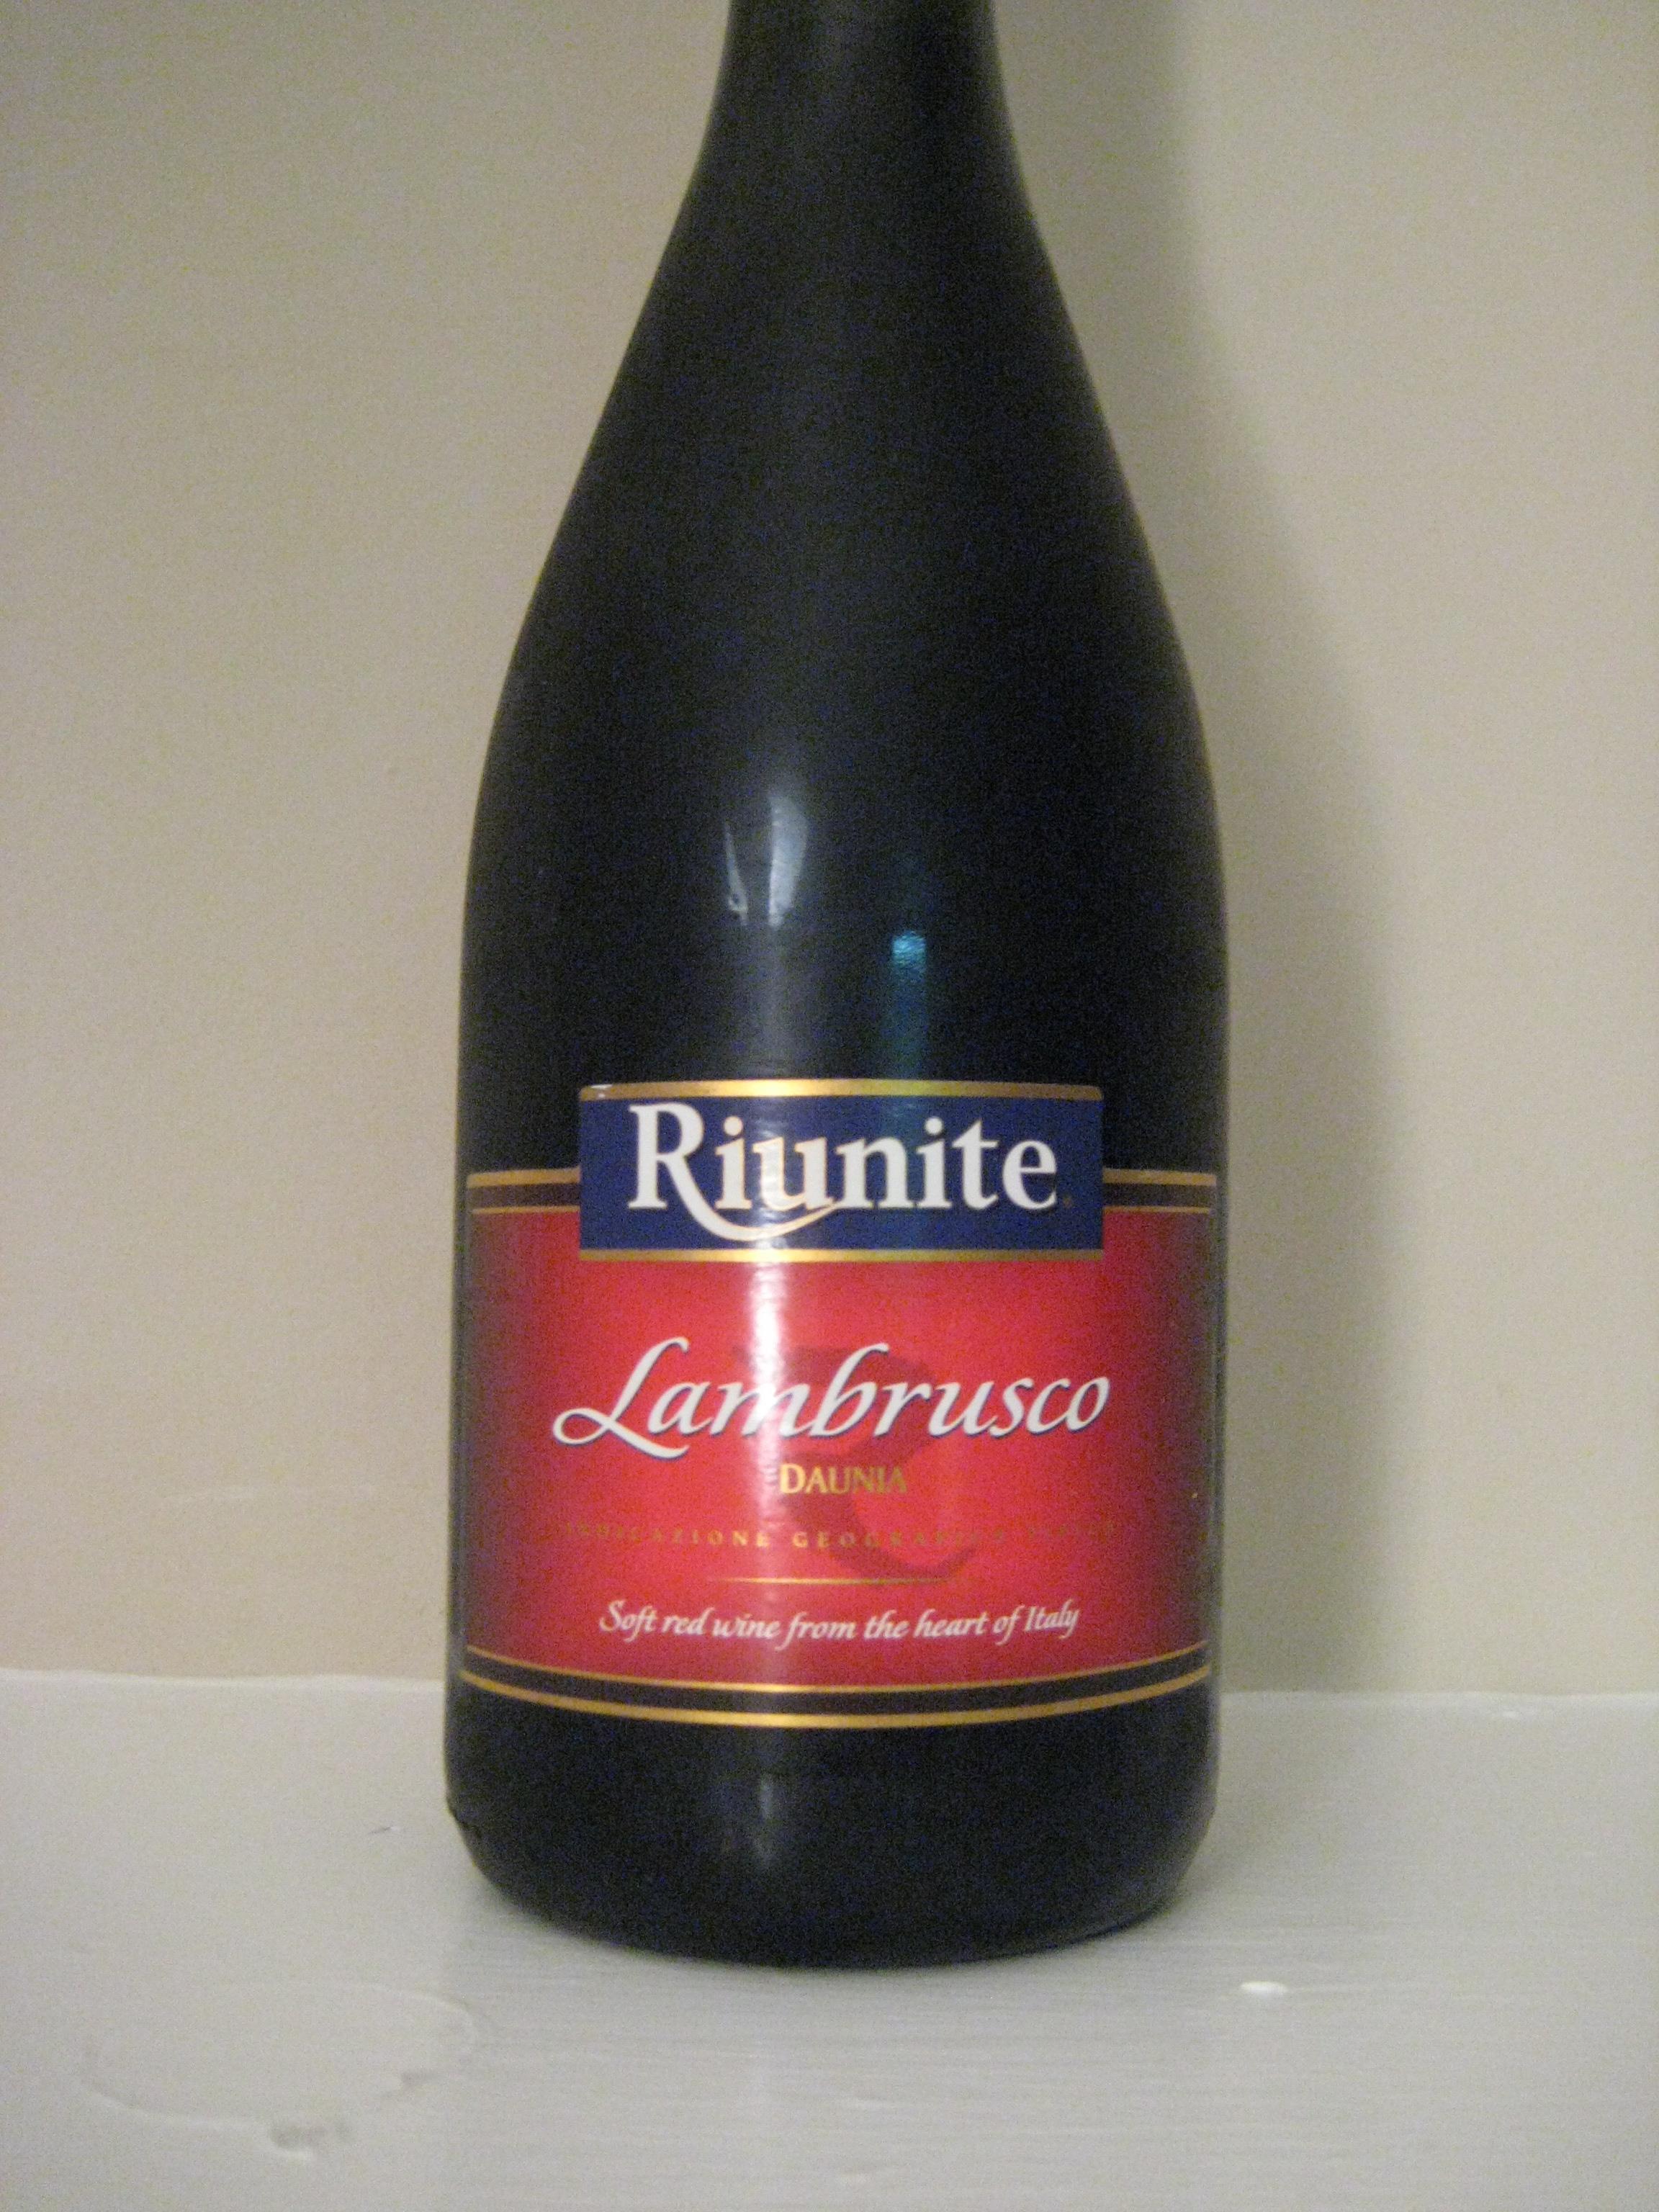 Riunite Lambrusco First Pour Wine